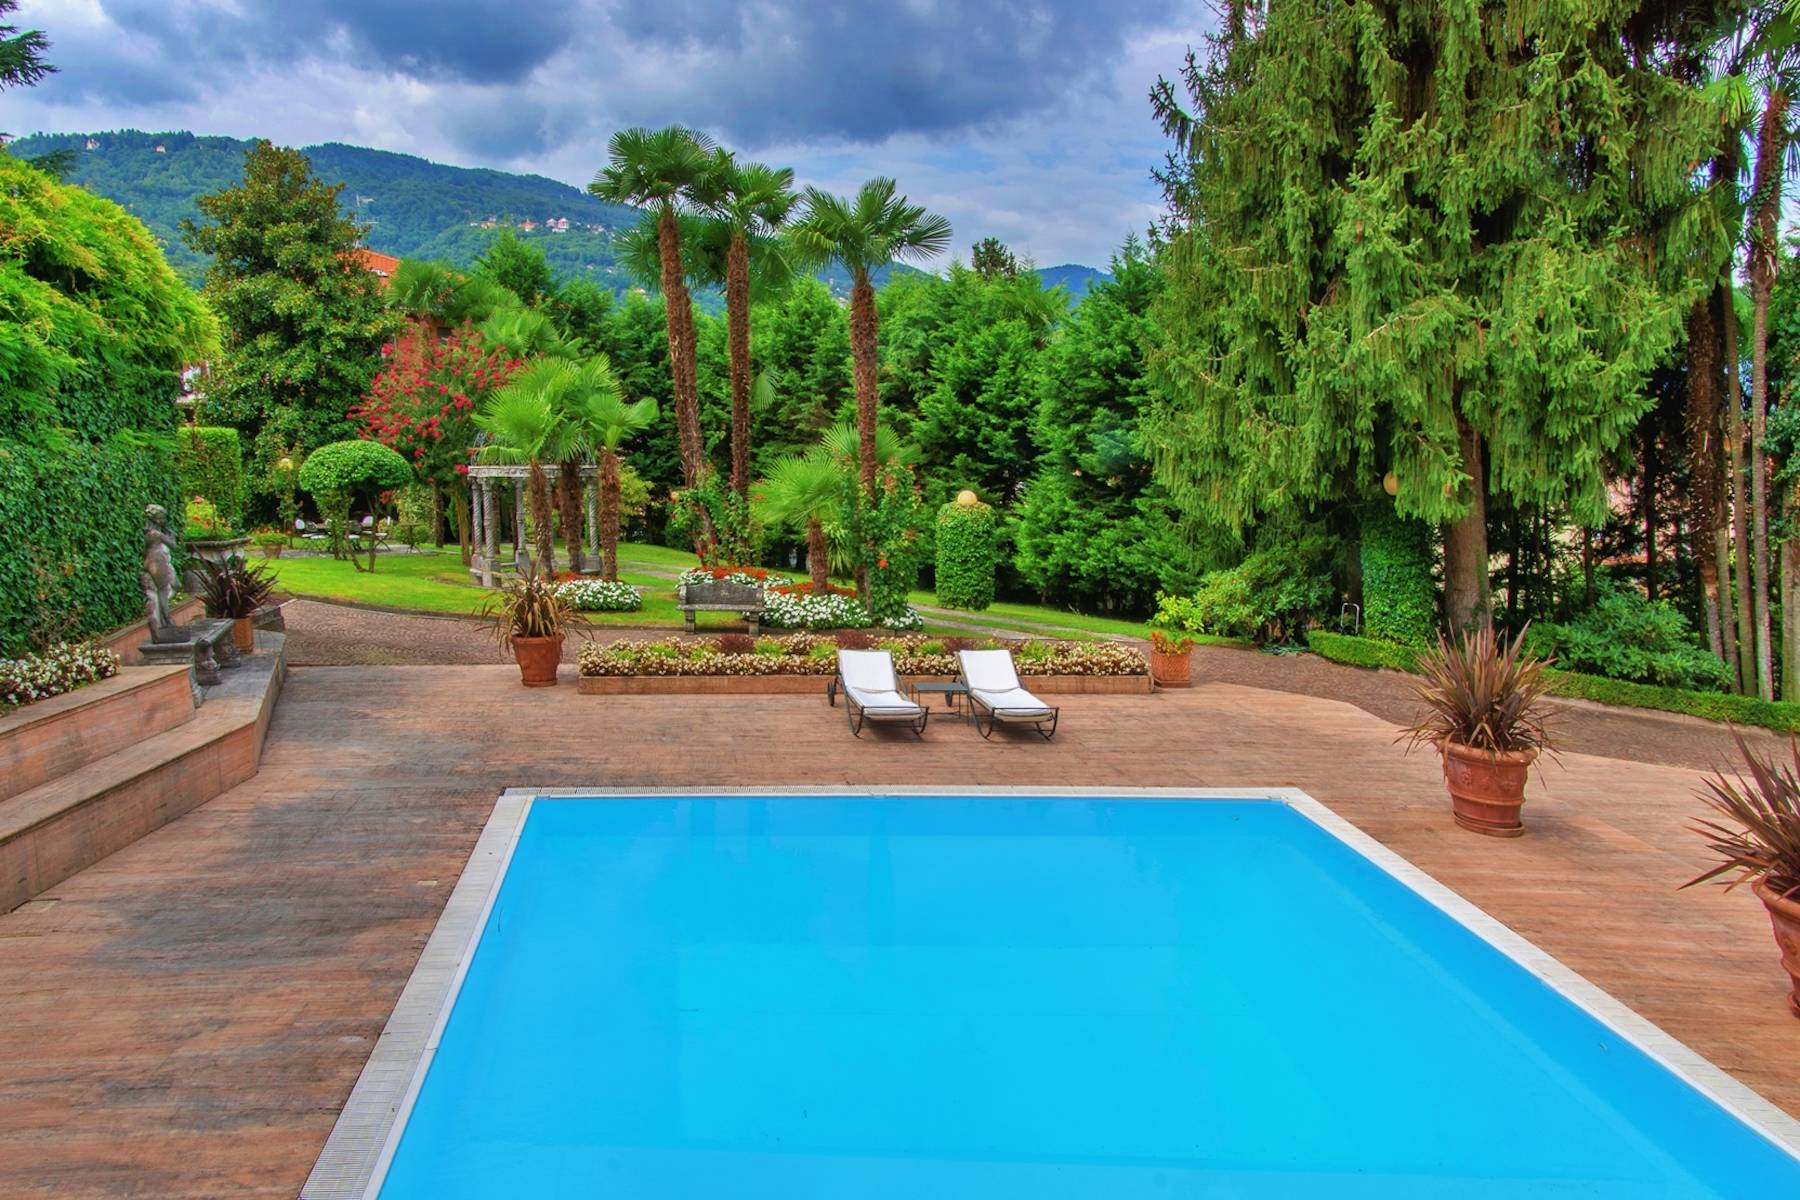 Villa in Vendita a Stresa: 5 locali, 700 mq - Foto 6